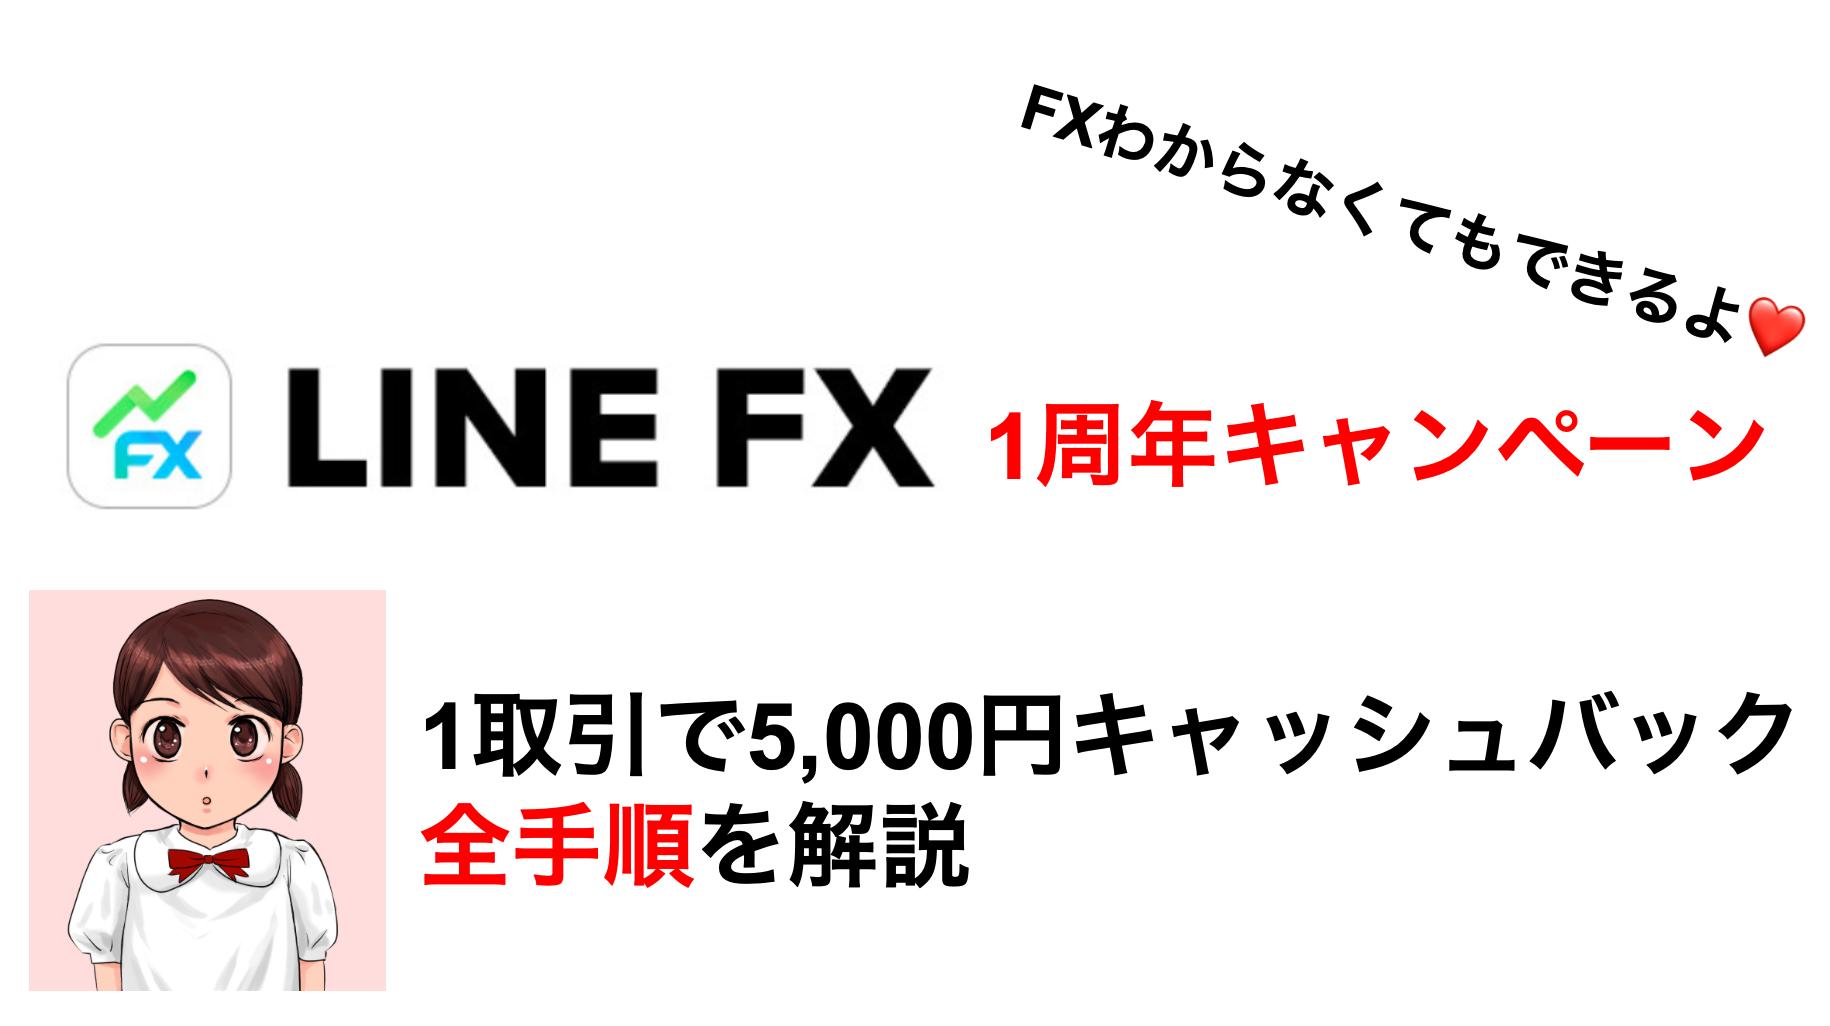 LINE FX スプレッド縮小キャンペーン